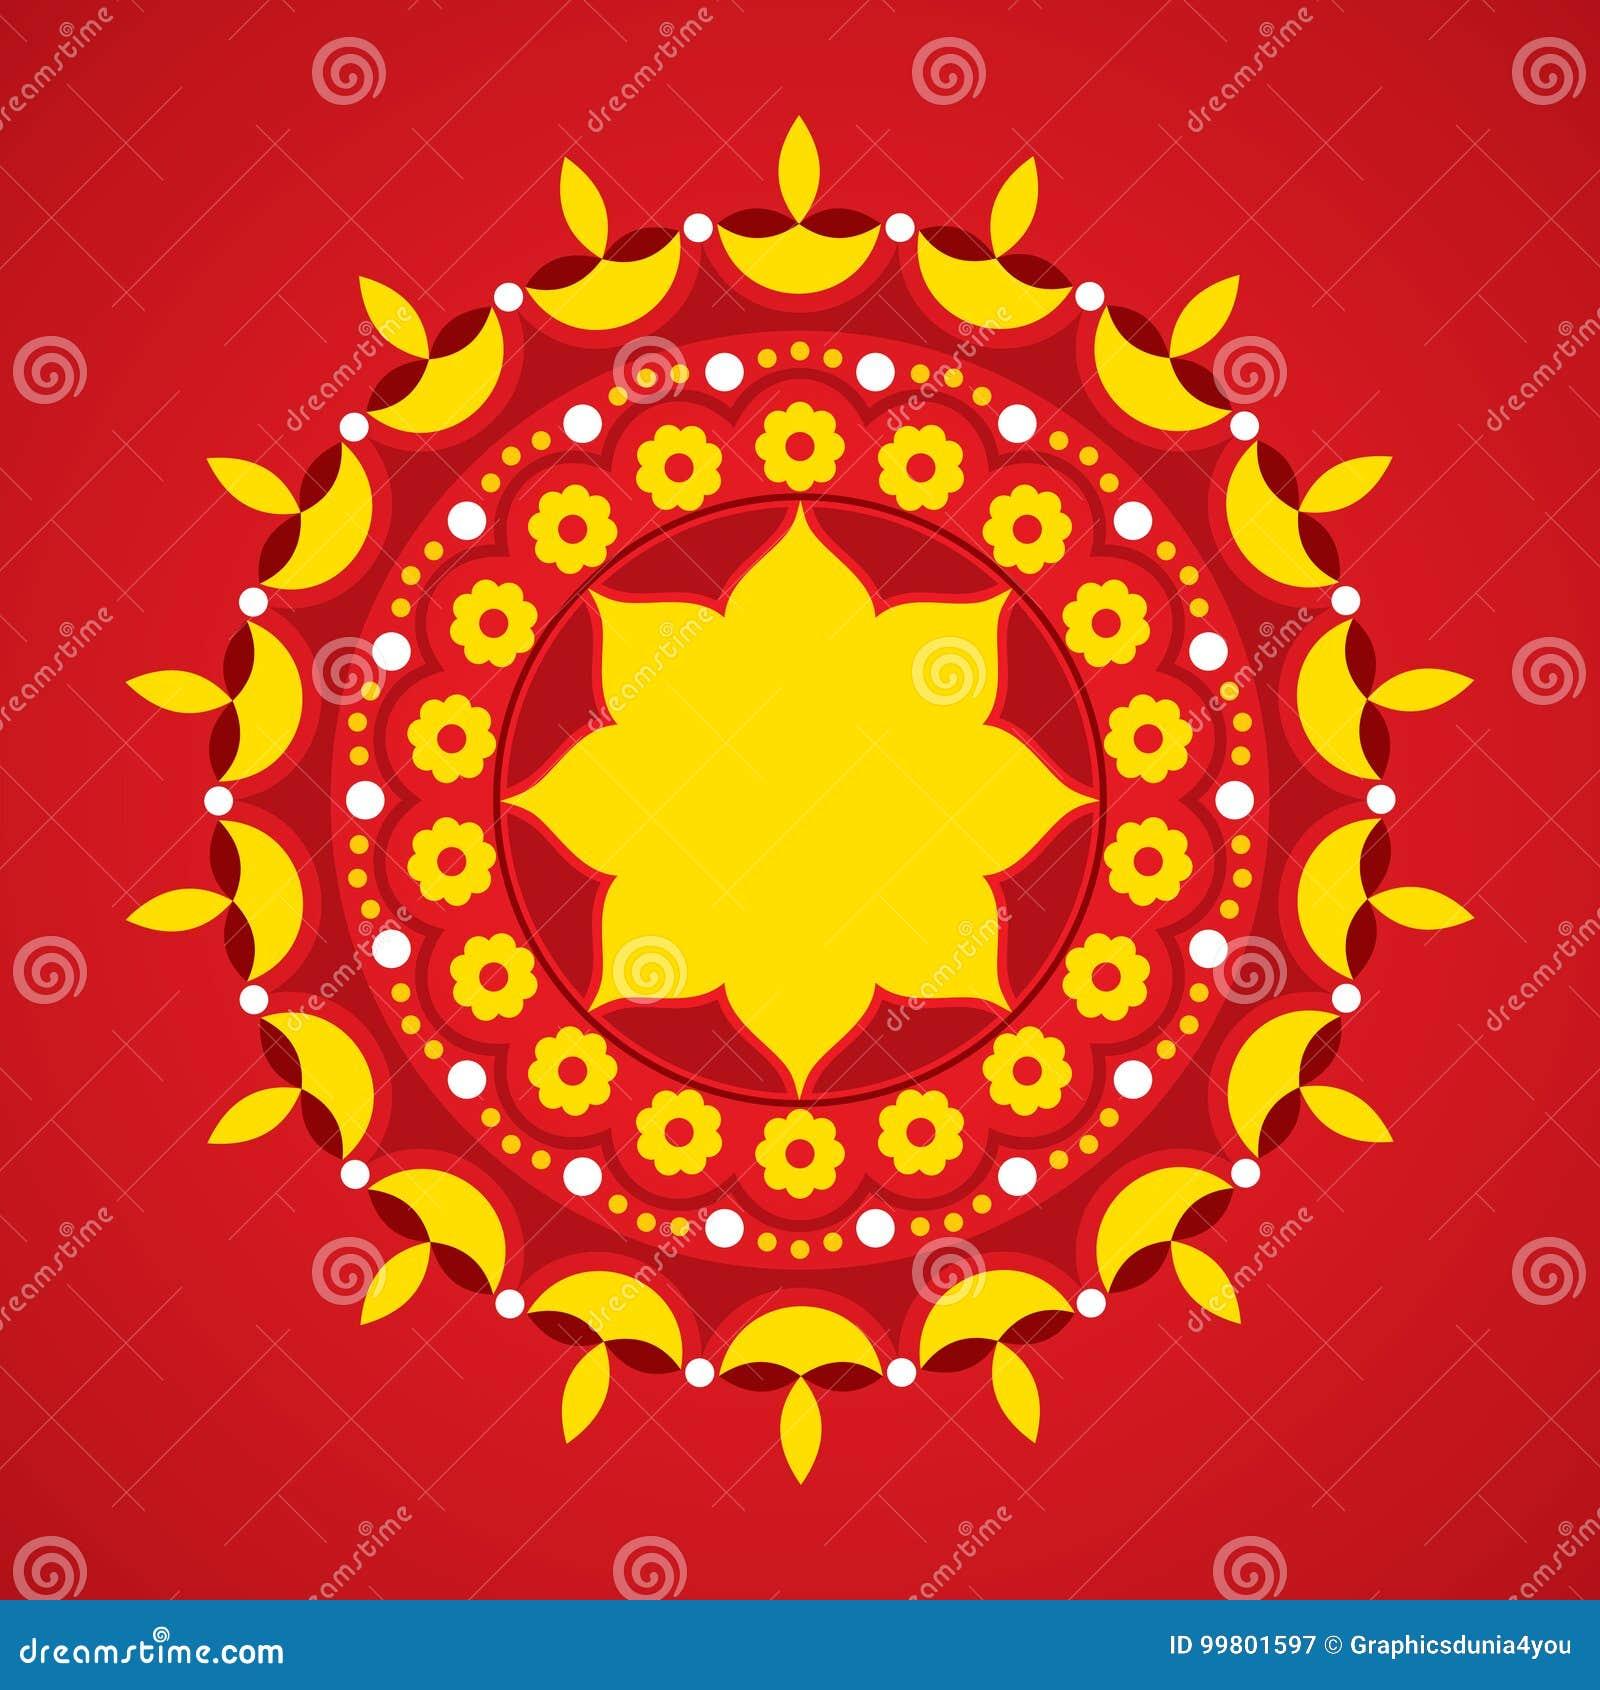 Illustration Of Diwali Utsav Greeting Or Poster Card Stock Vector